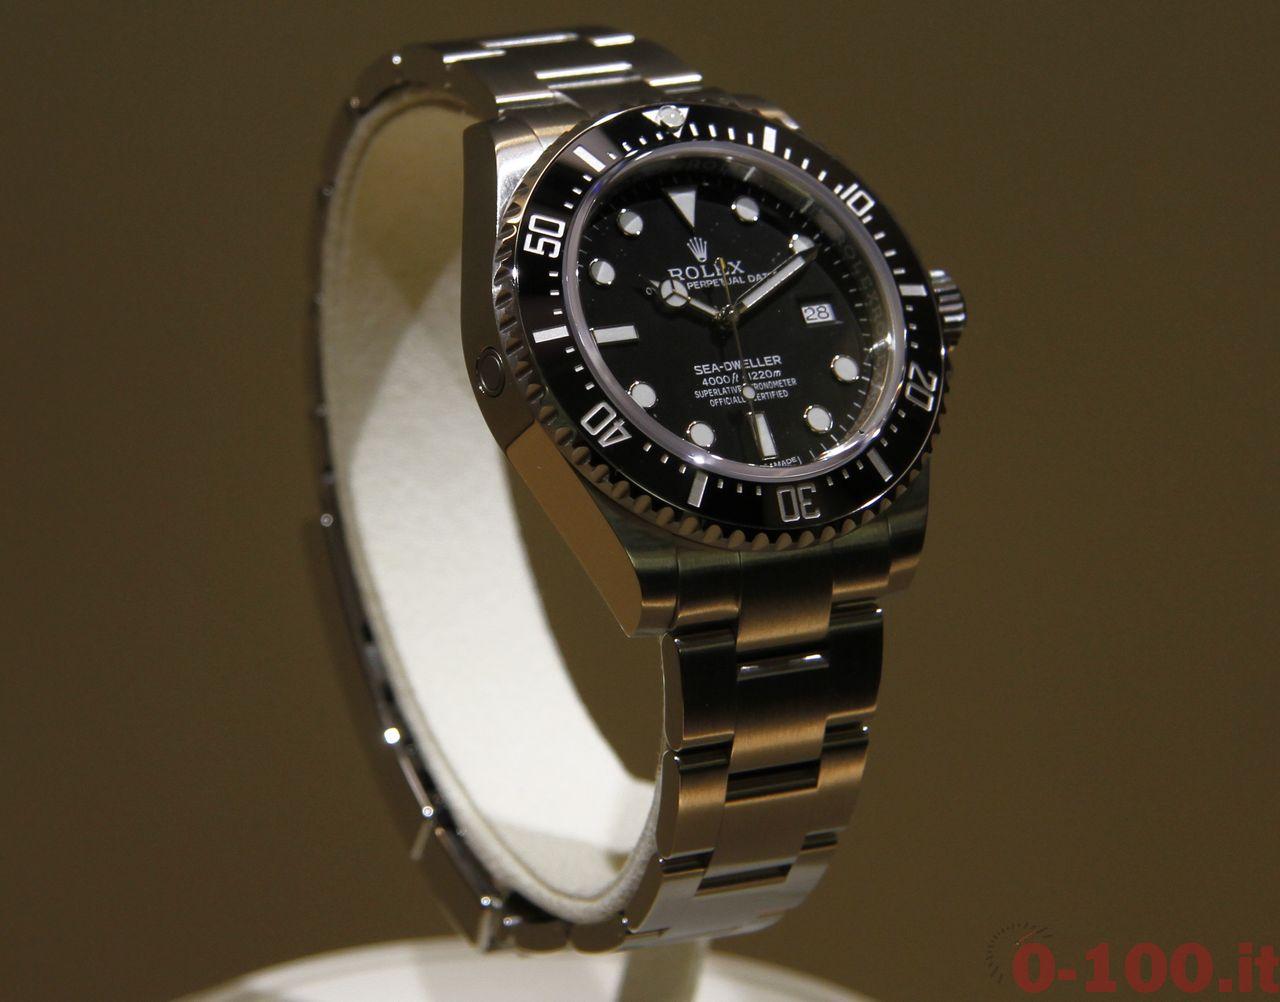 rolex-seadweller-4000-cherachrom-baselworld-2014-0-100_2